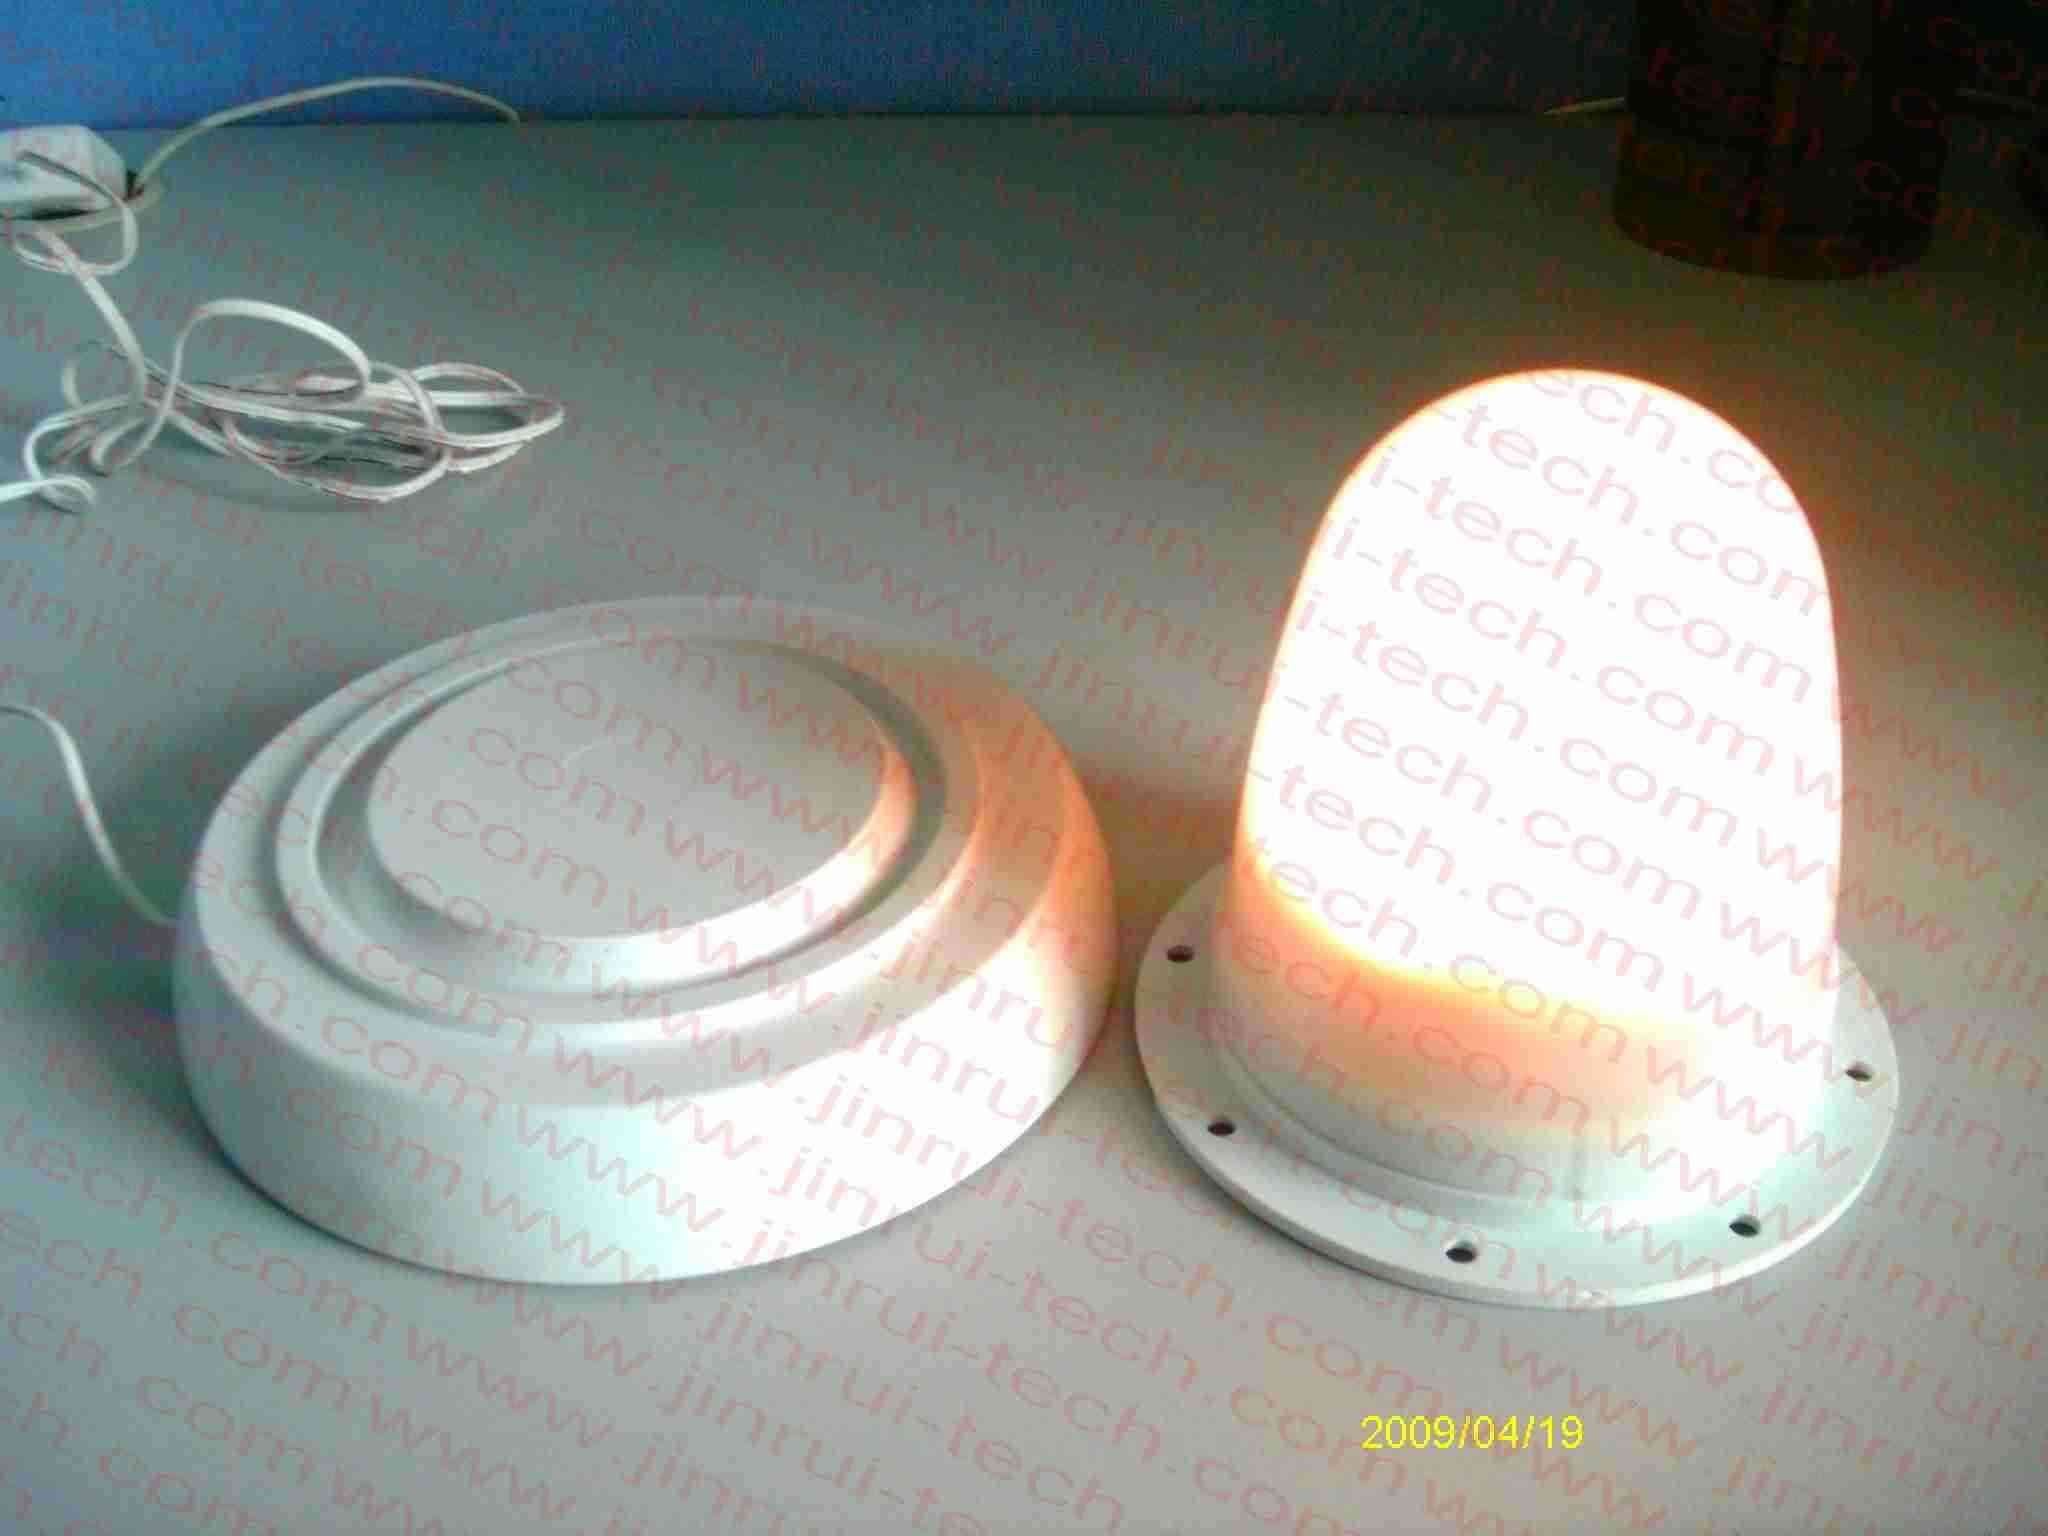 JR9897 RGBW 24键红外遥控情趣灯控制器,RGBW情趣灯控制